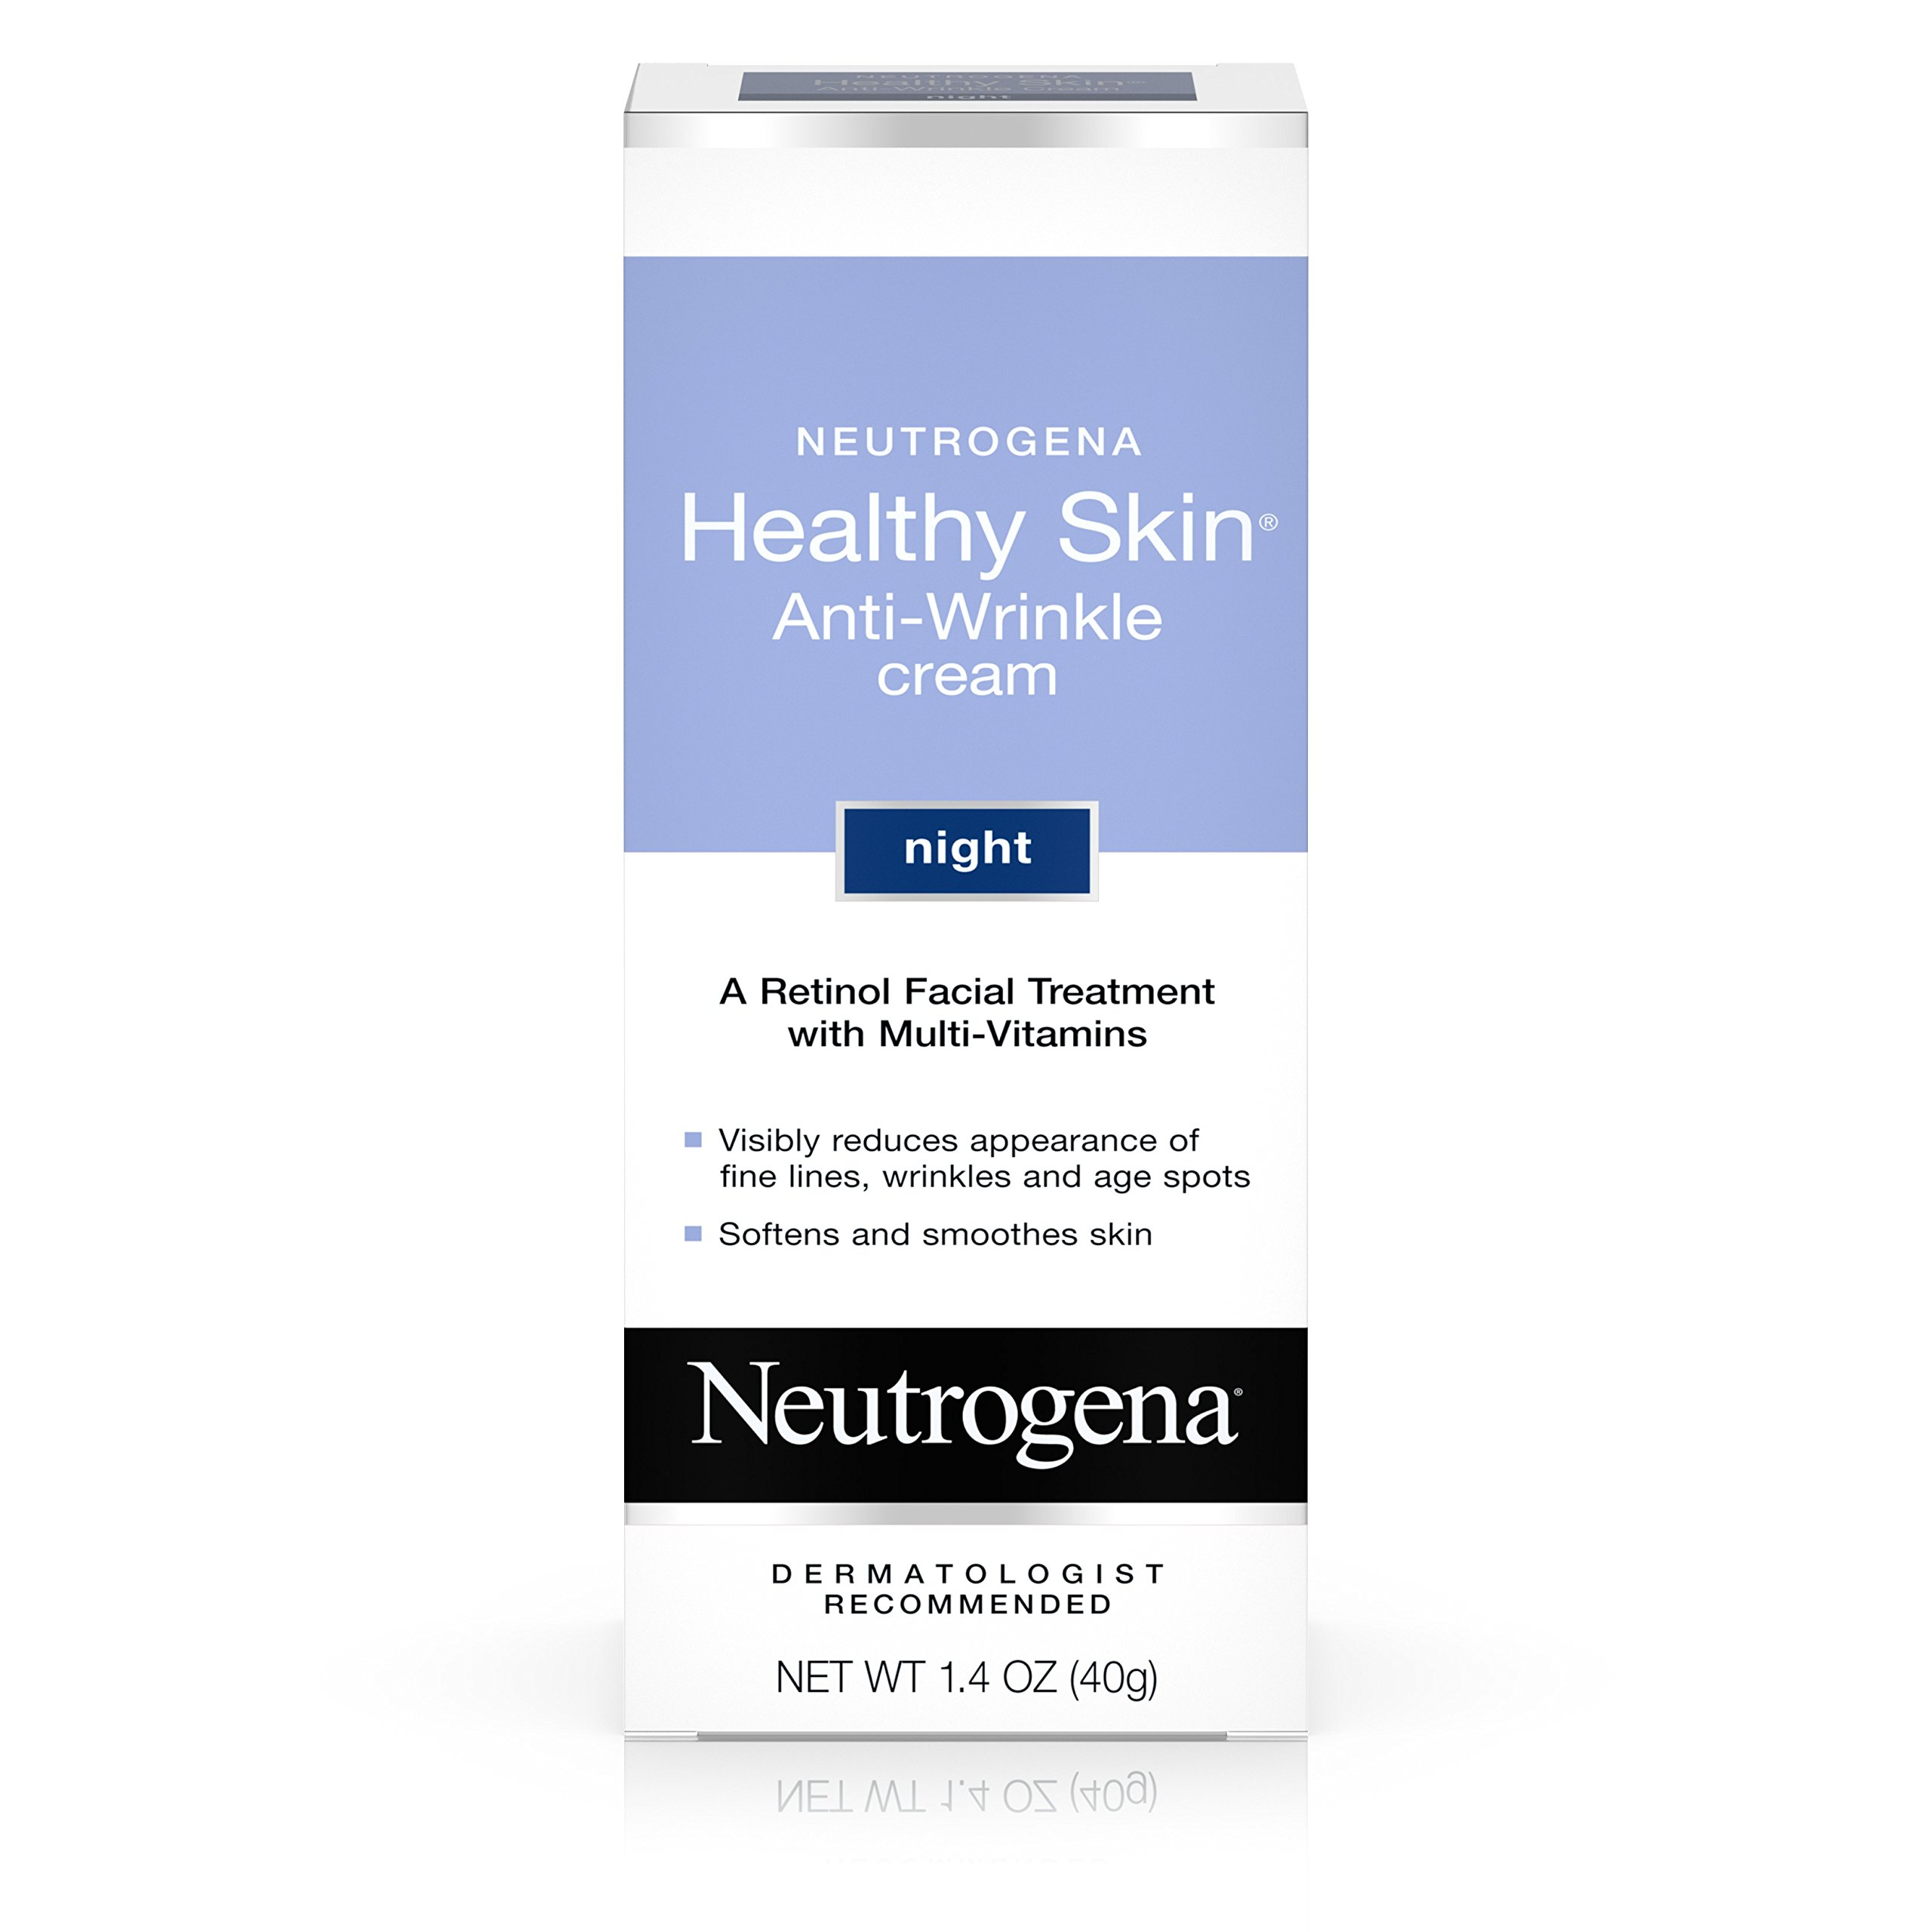 Galleon - Neutrogena Healthy Skin Anti-Wrinkle Cream Night